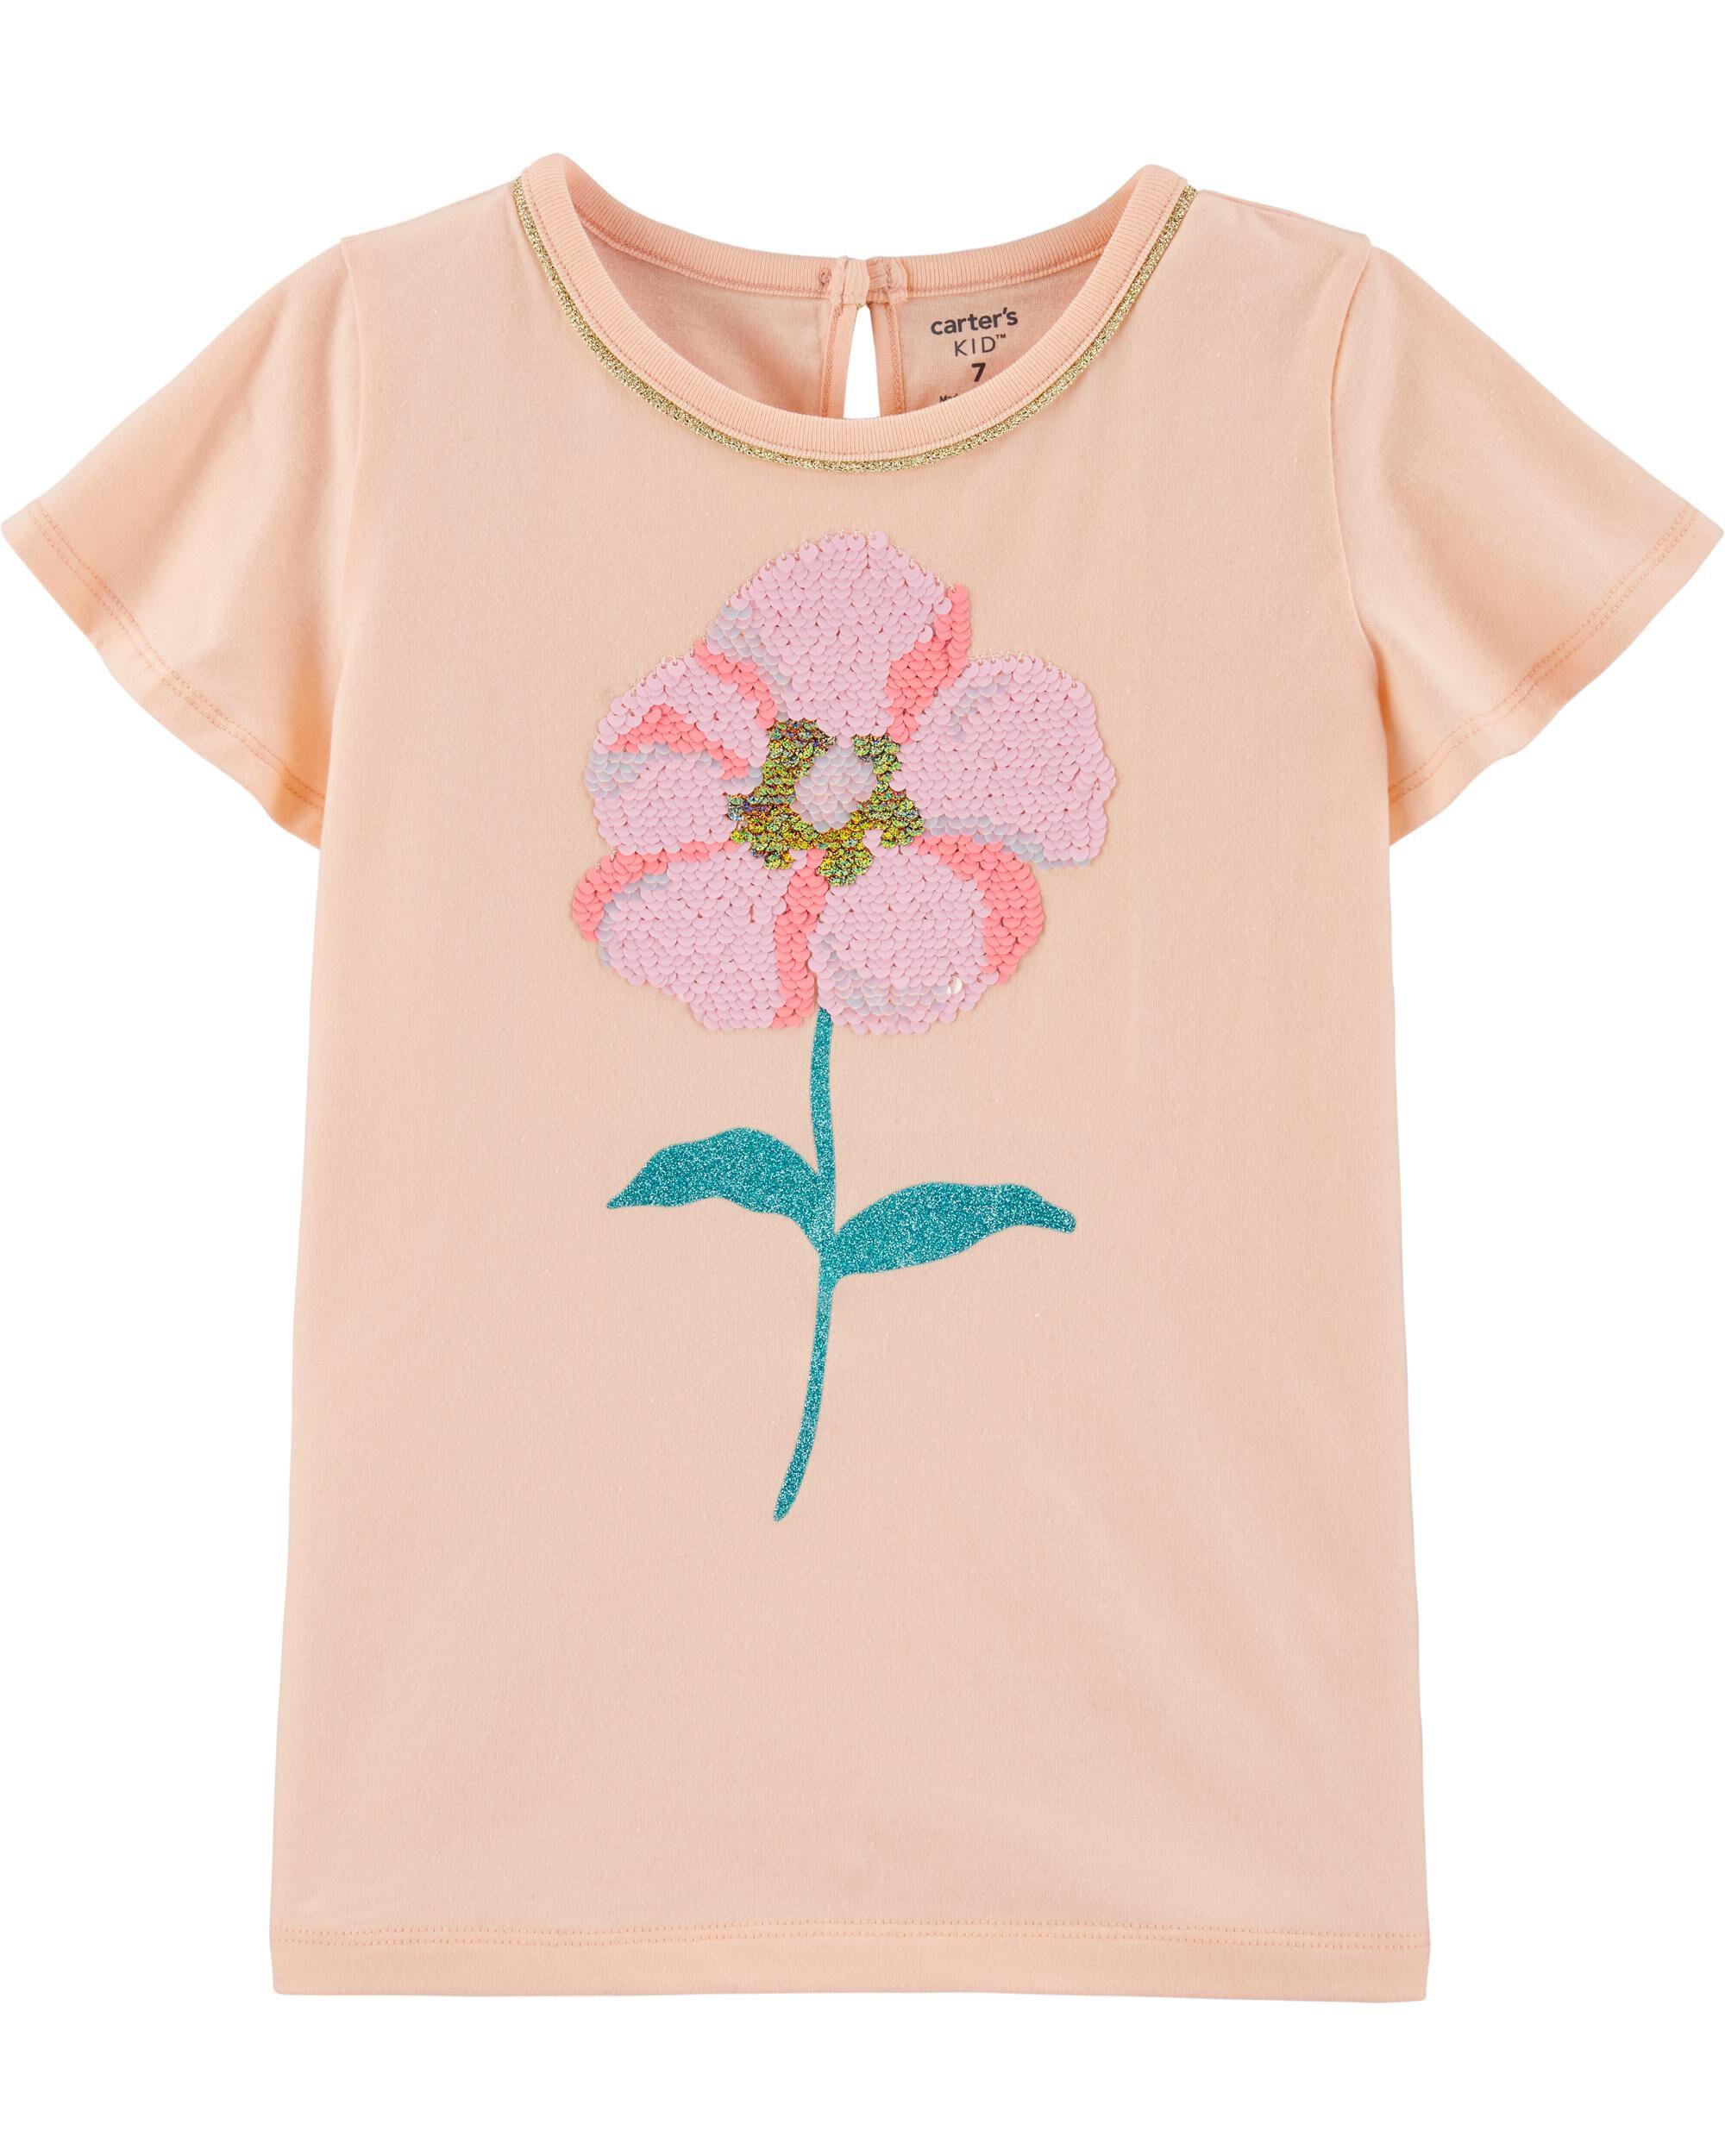 *CLEARANCE* Flip Sequin Flower Jersey Tee